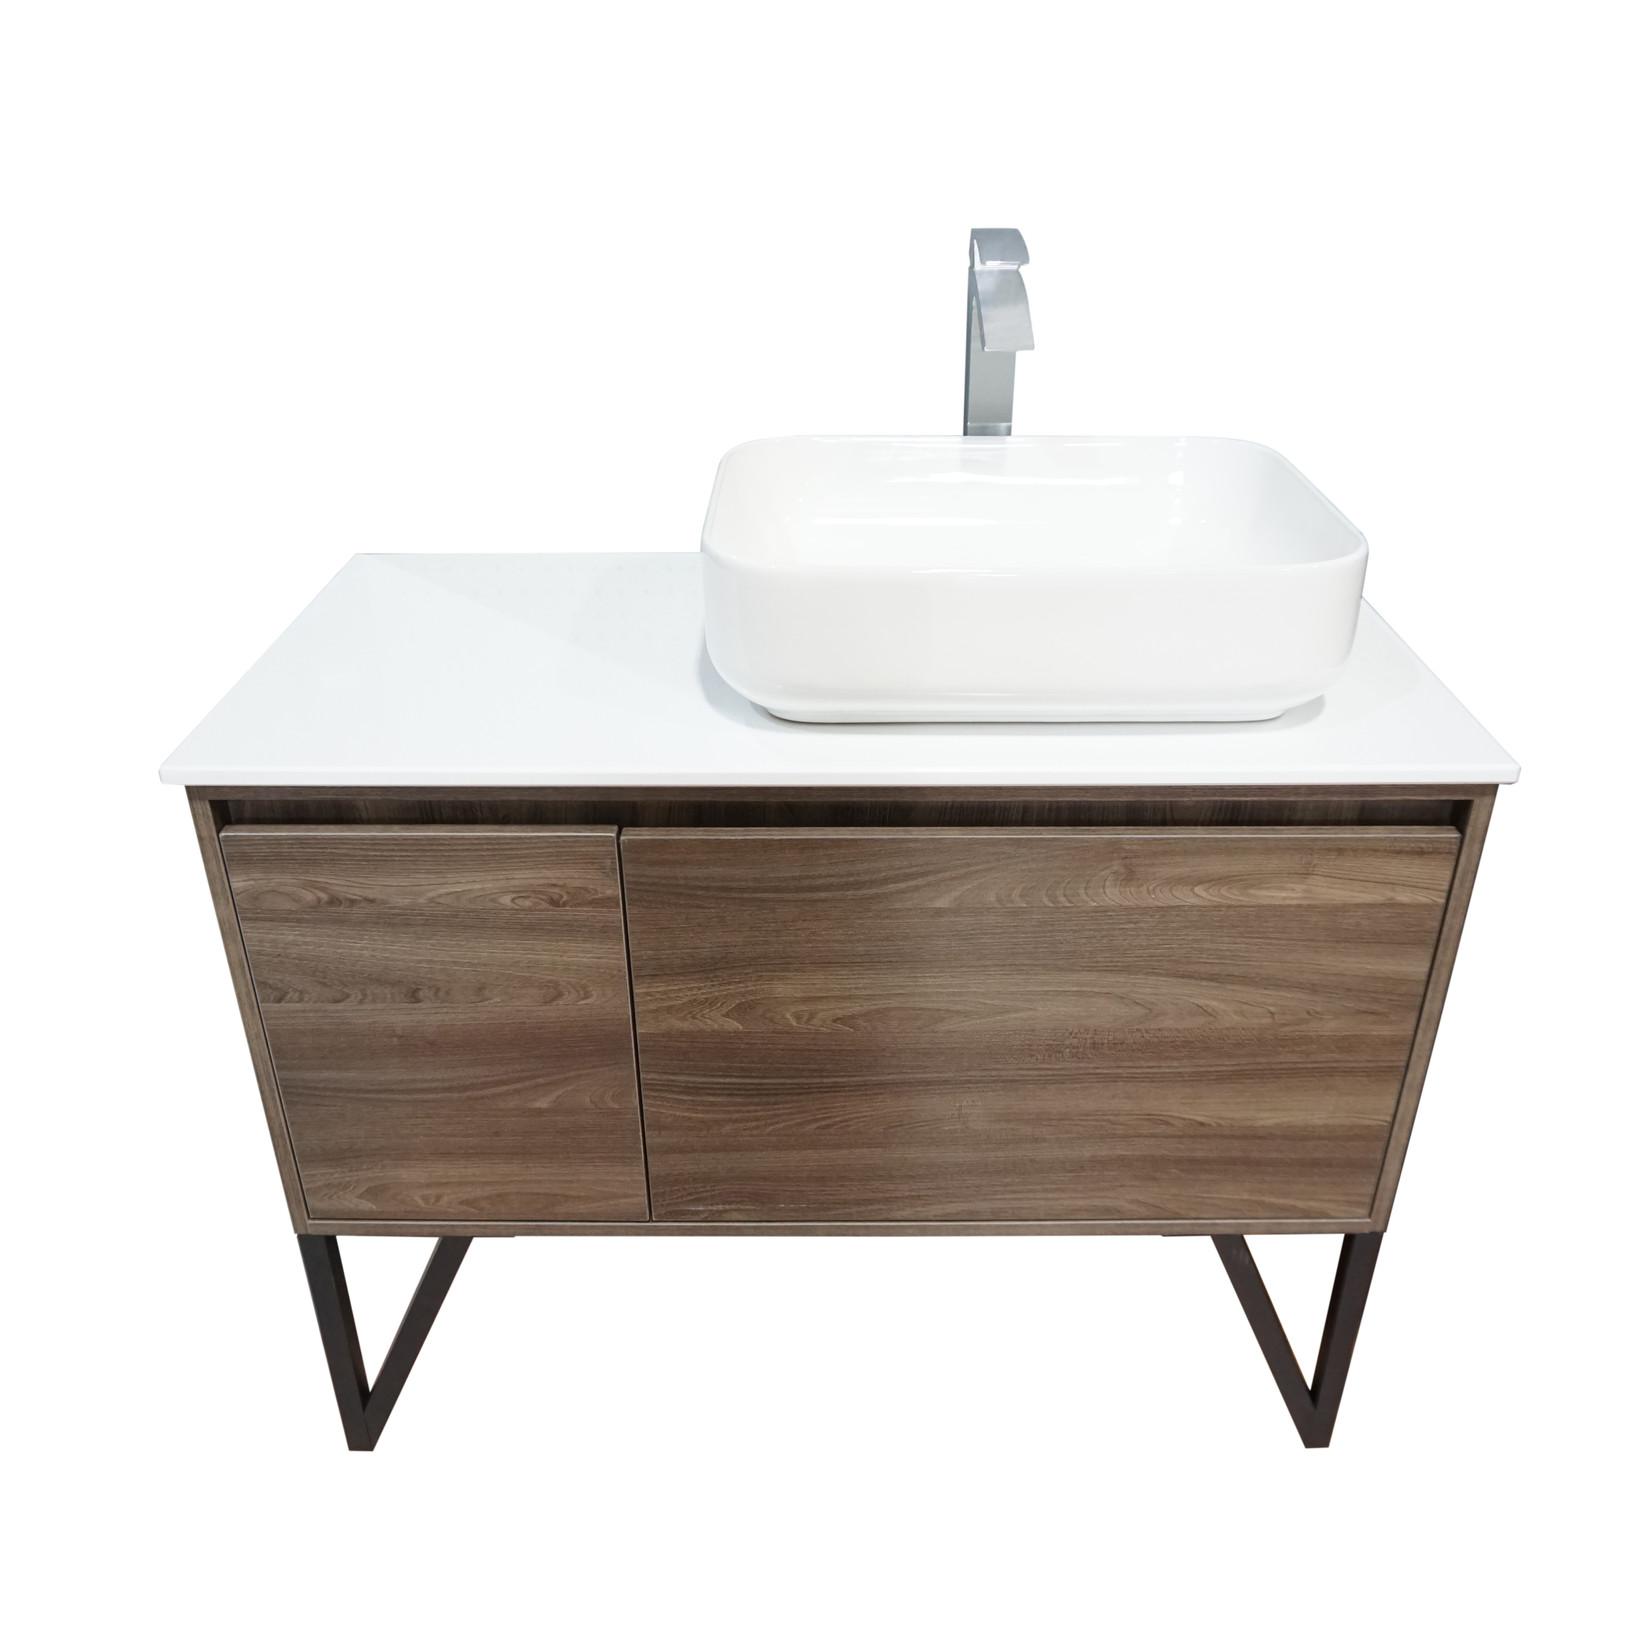 40 '' wood effect white sink vanity CDC 90138